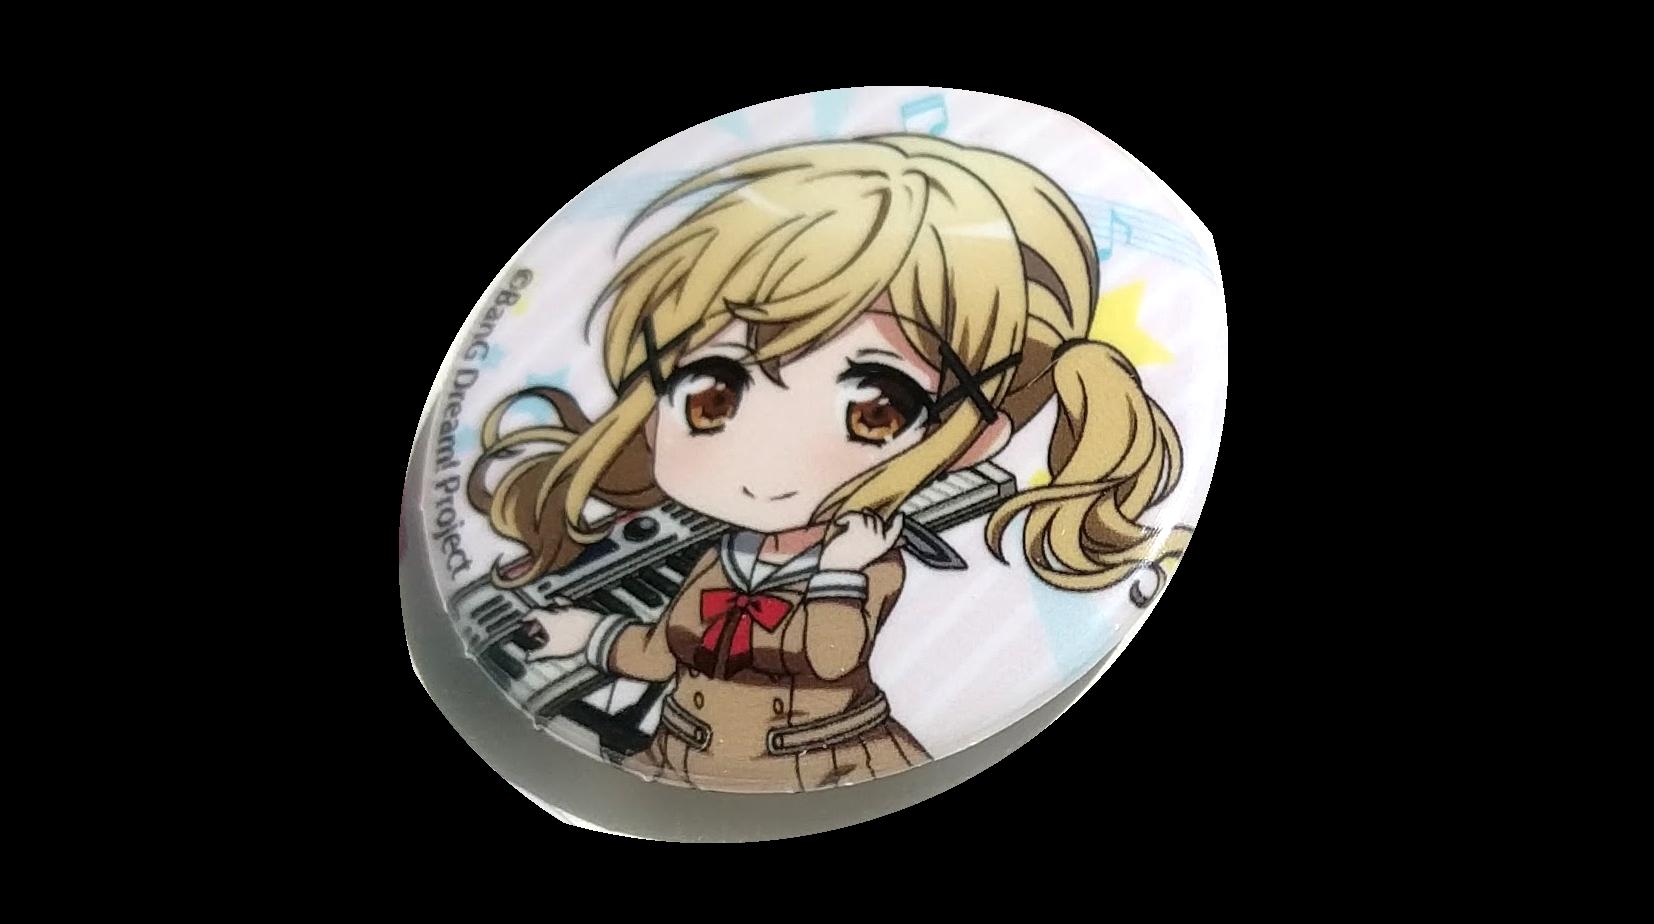 Arisa Ichigaya badge giveaway